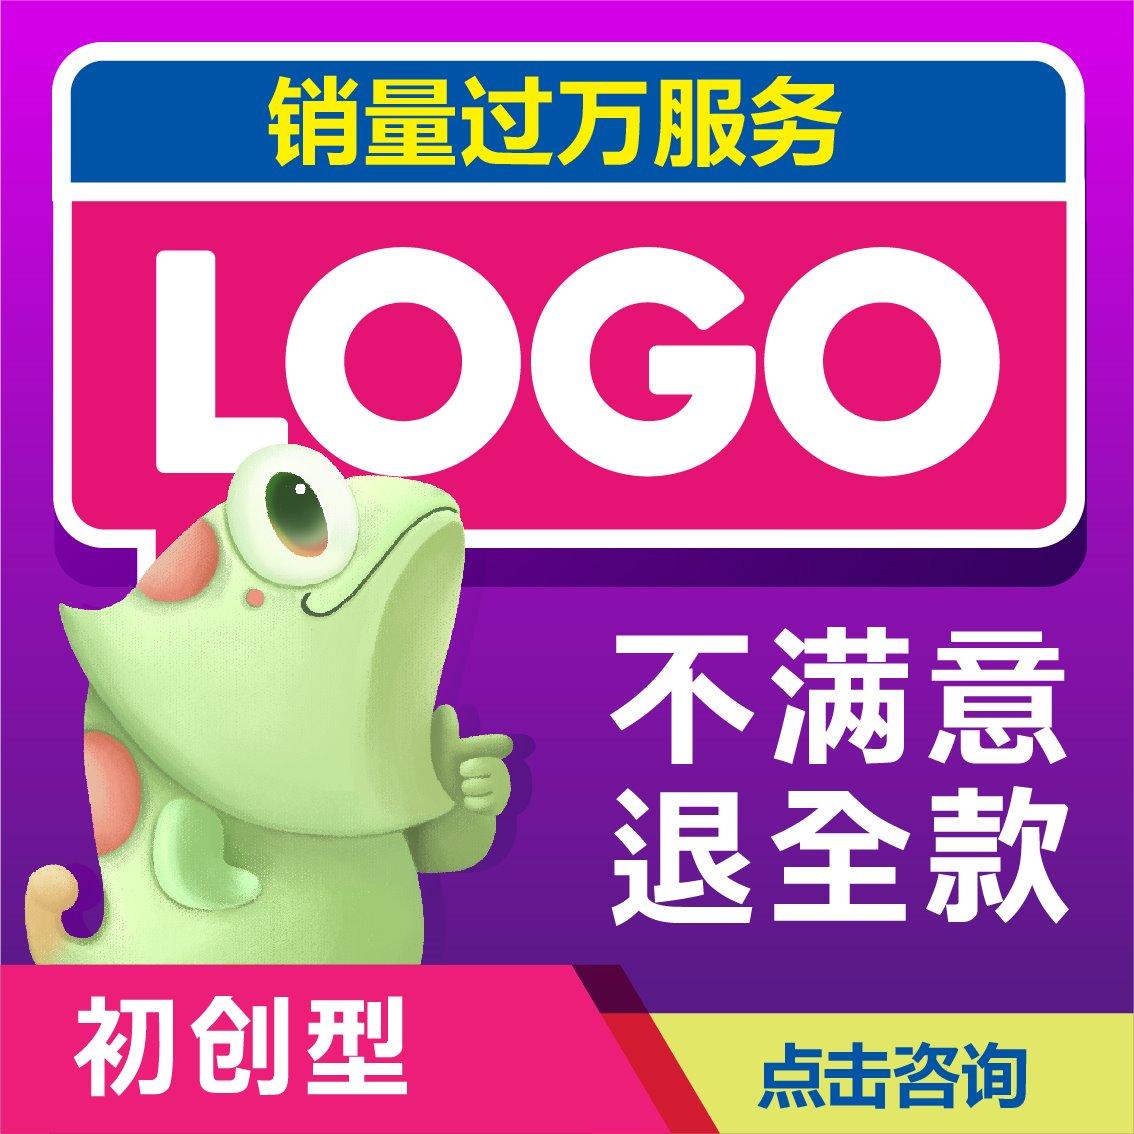 logo设计商标卡通教育企业品牌标识餐饮教育母婴品牌LOGO